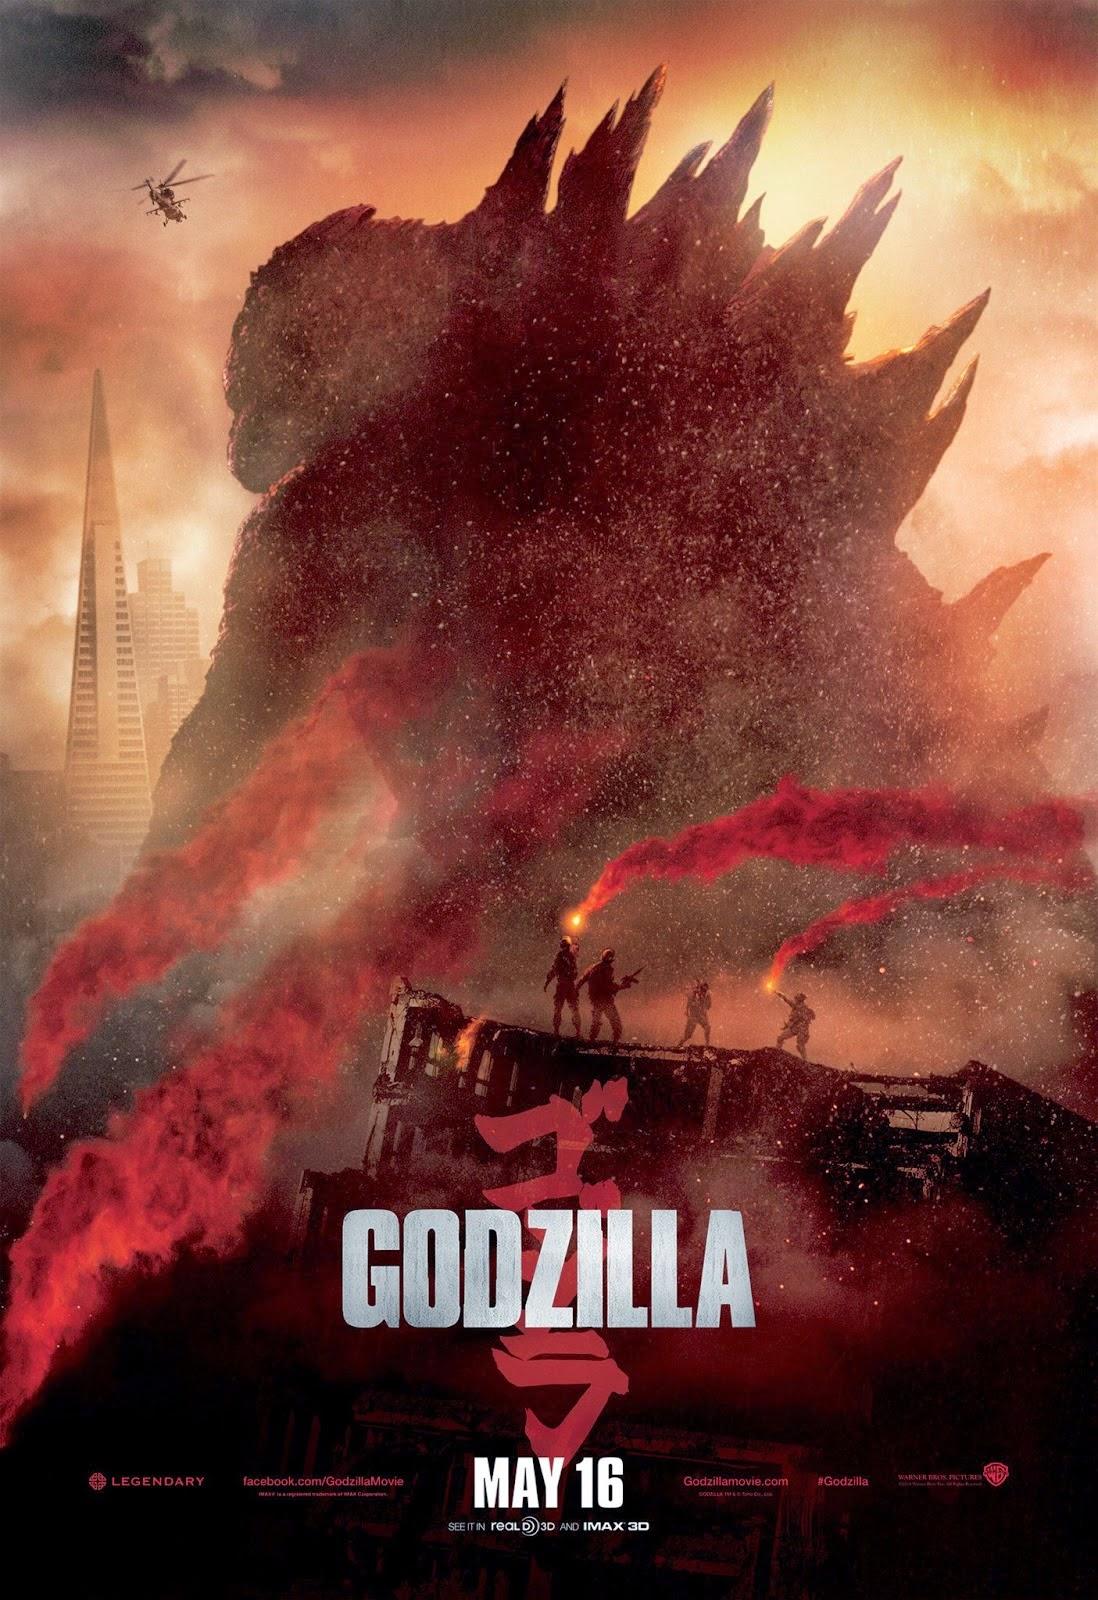 Ver Godzilla (2014) Online